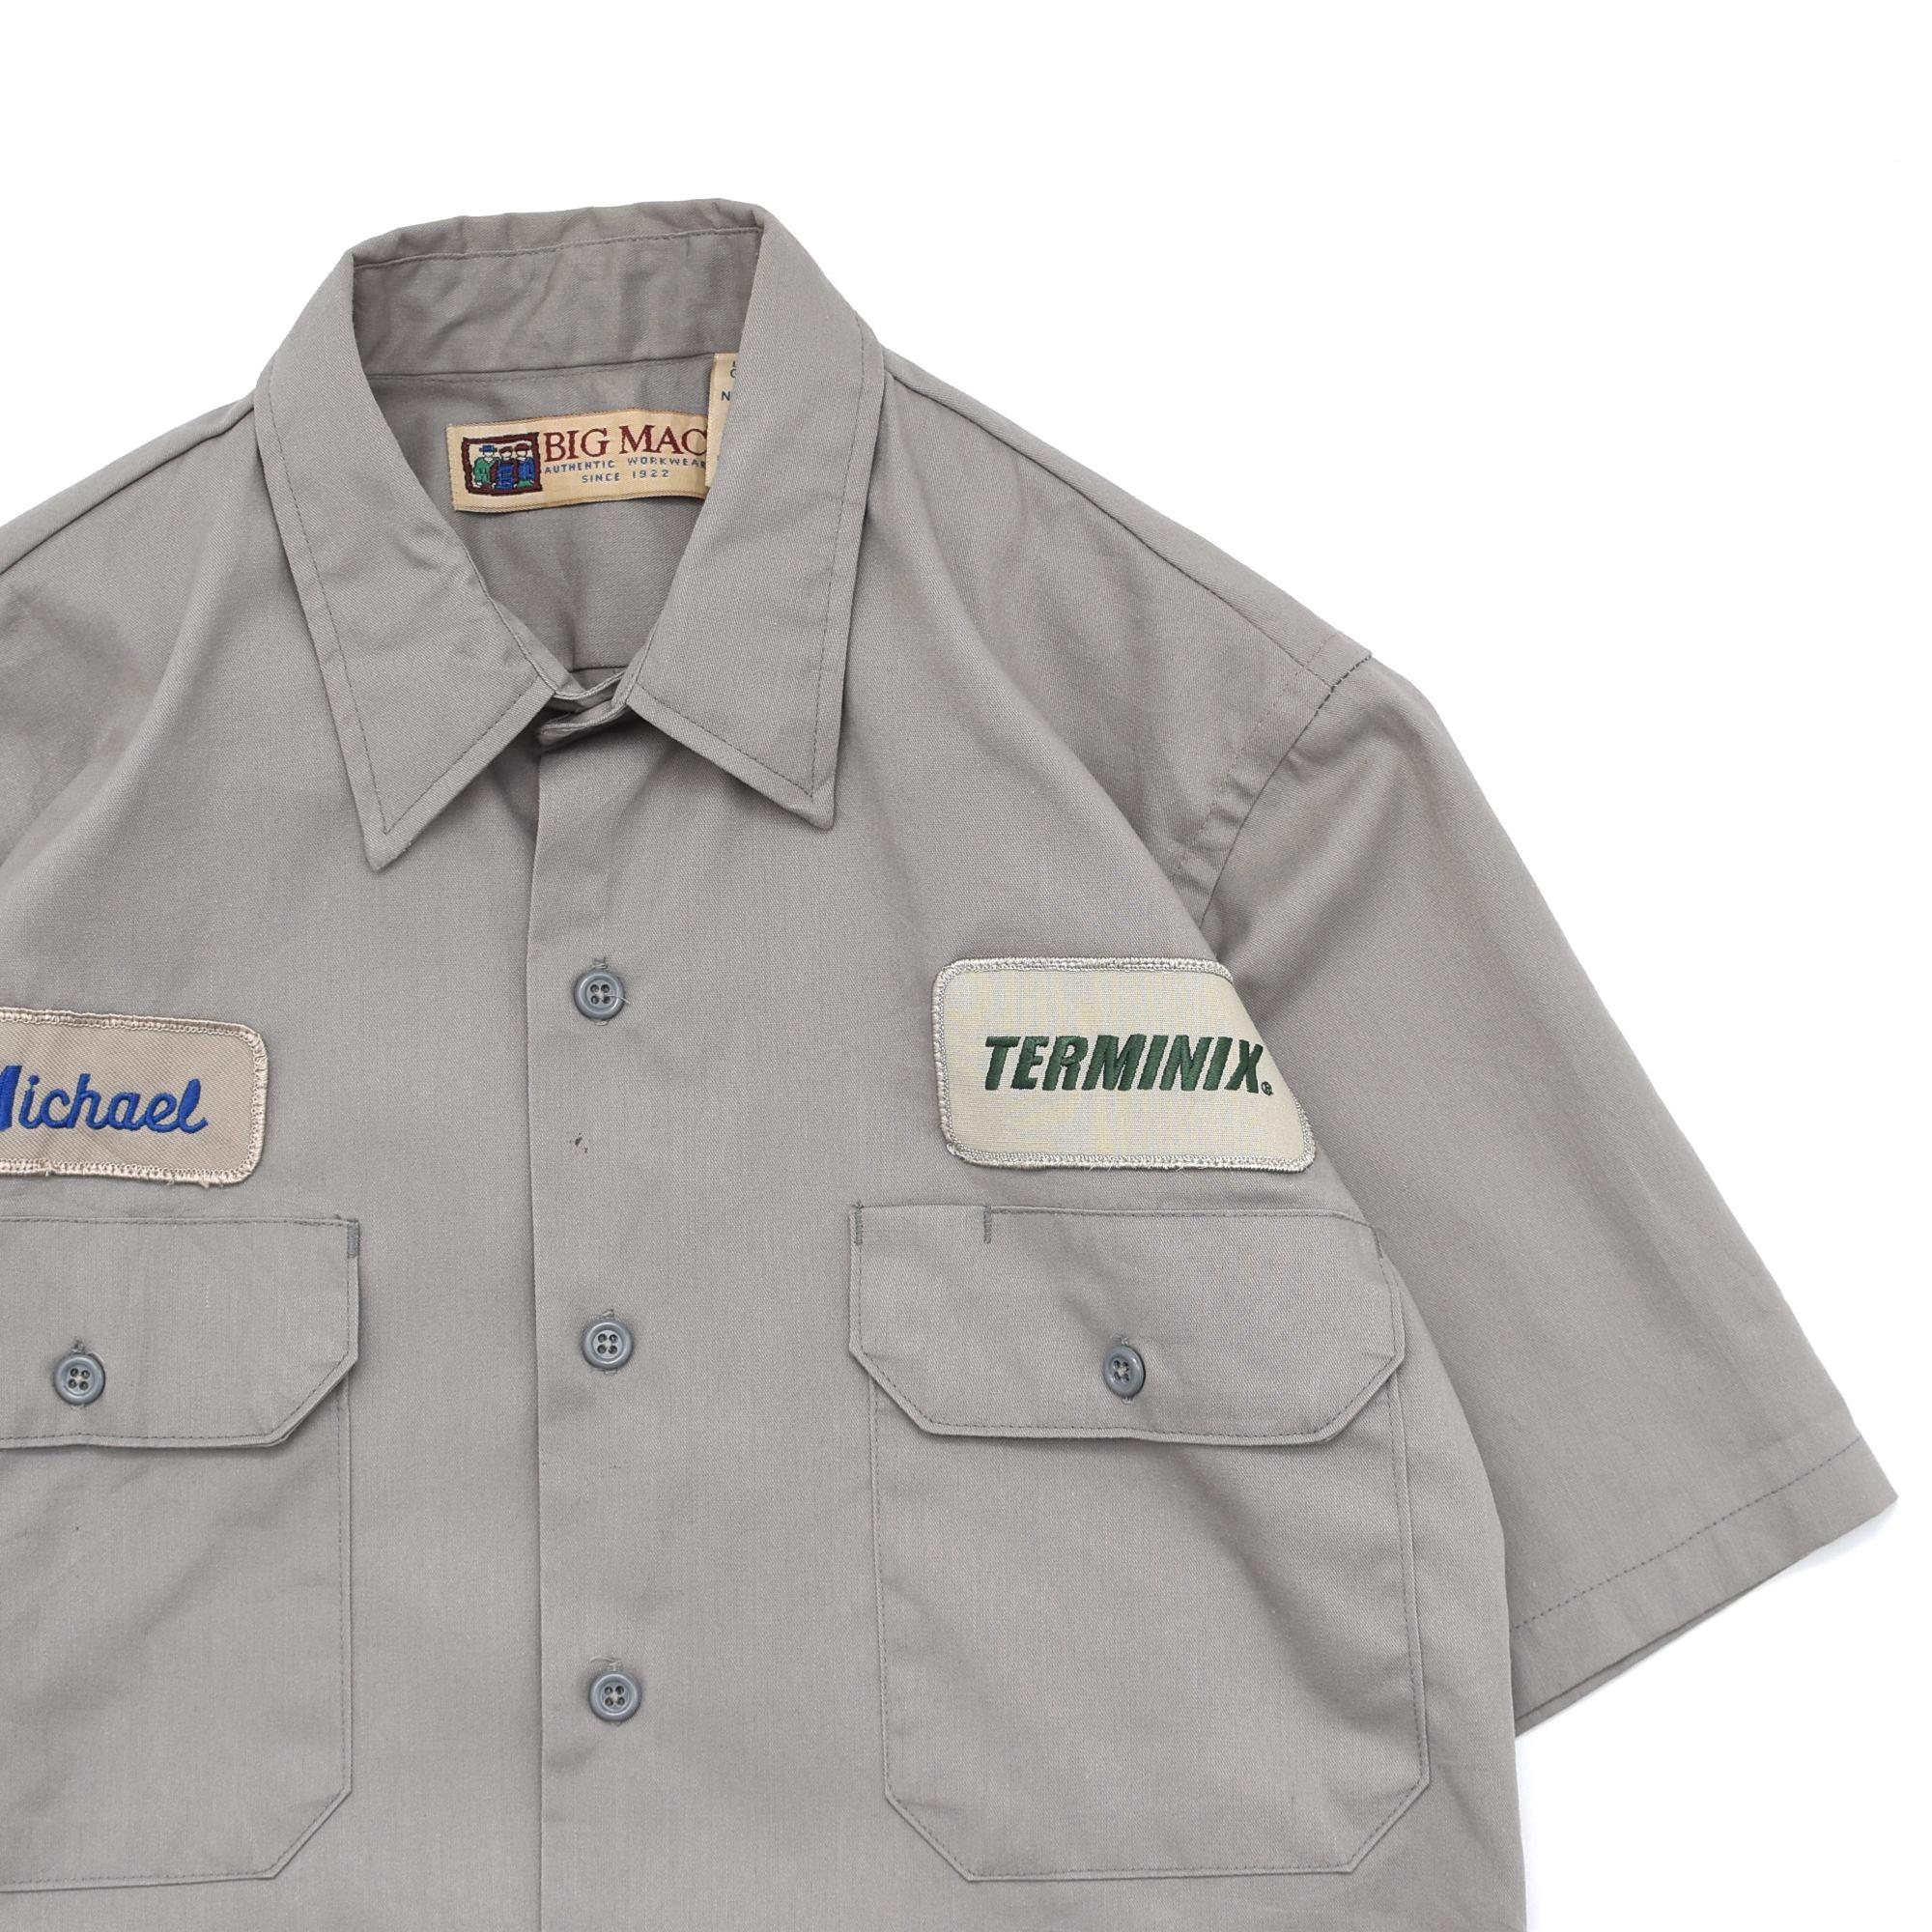 90's BIG MAC twill work shirt Made in USA